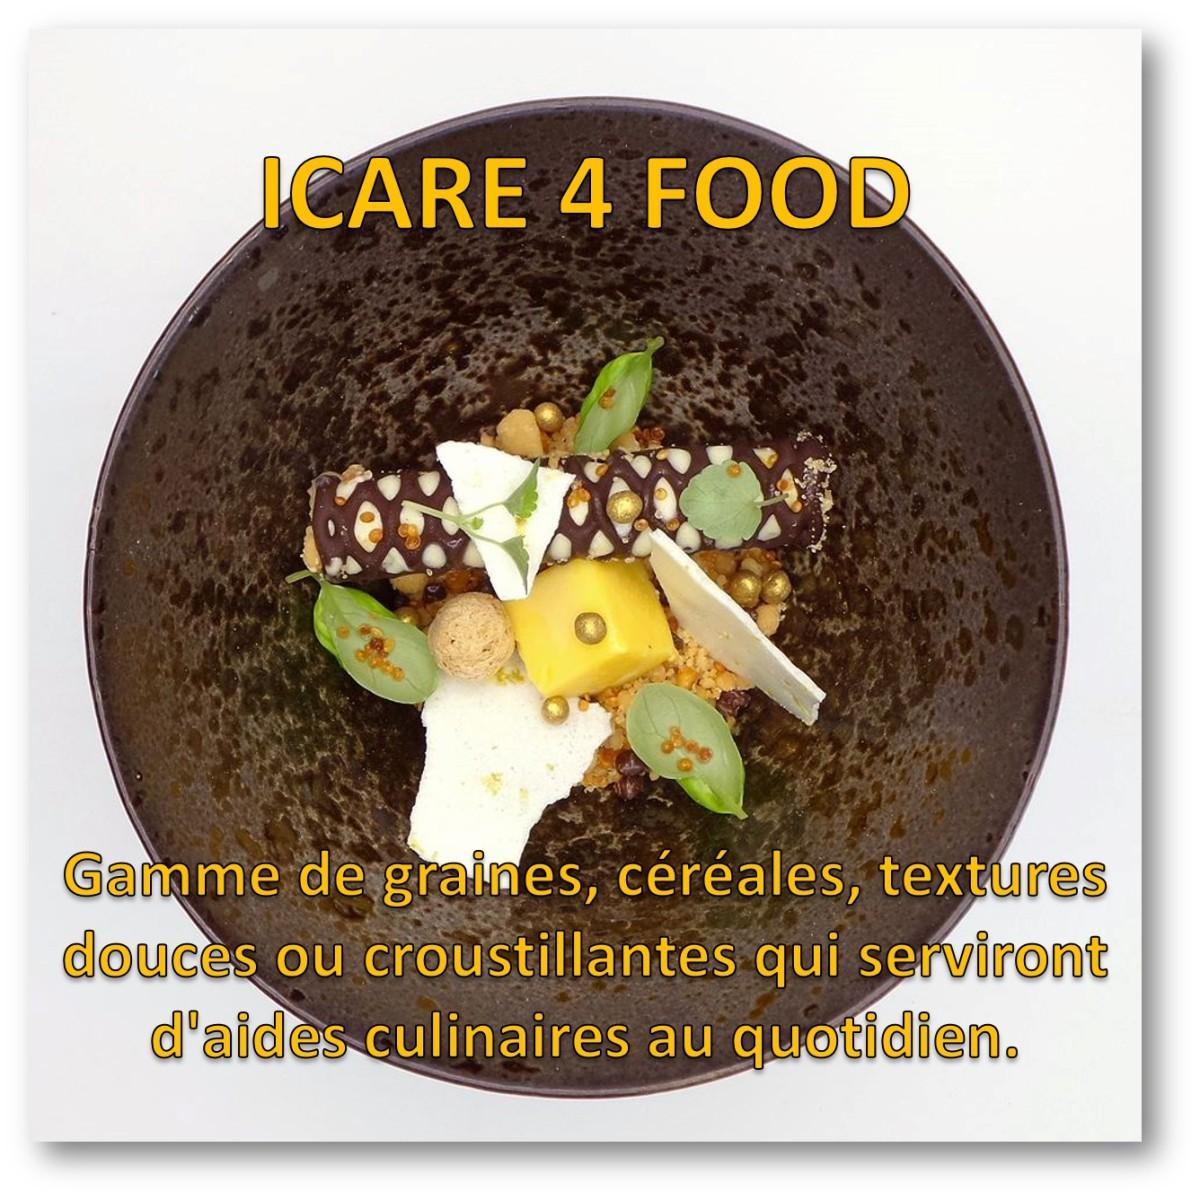 icare-4-food-graine-cereale-texture-douce-croustillante-sens-gourmet